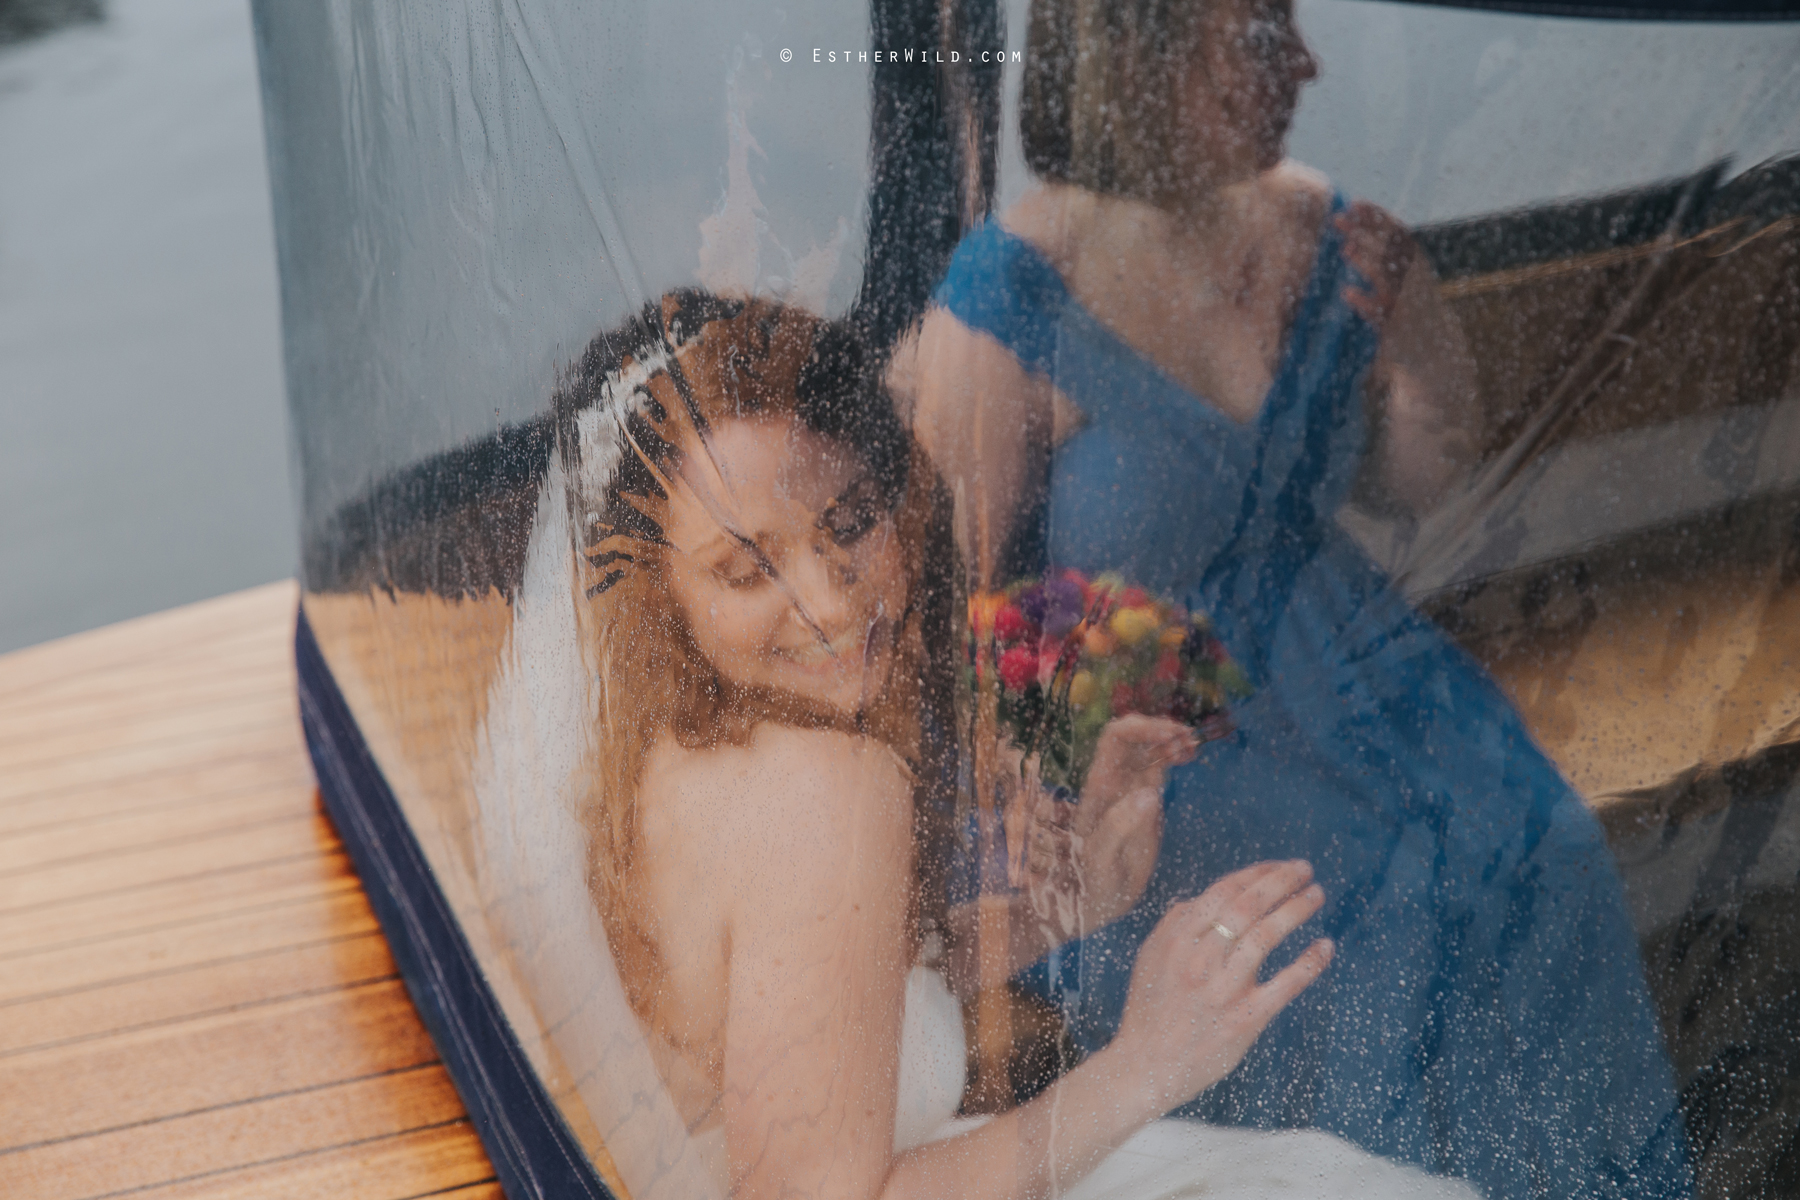 The_BoatHouse_Wedding_Venue_Ormesby_Norfolk_Broads_Boat_Wedding_Photography_Esther_Wild_Photographer_IMG_0753.jpg